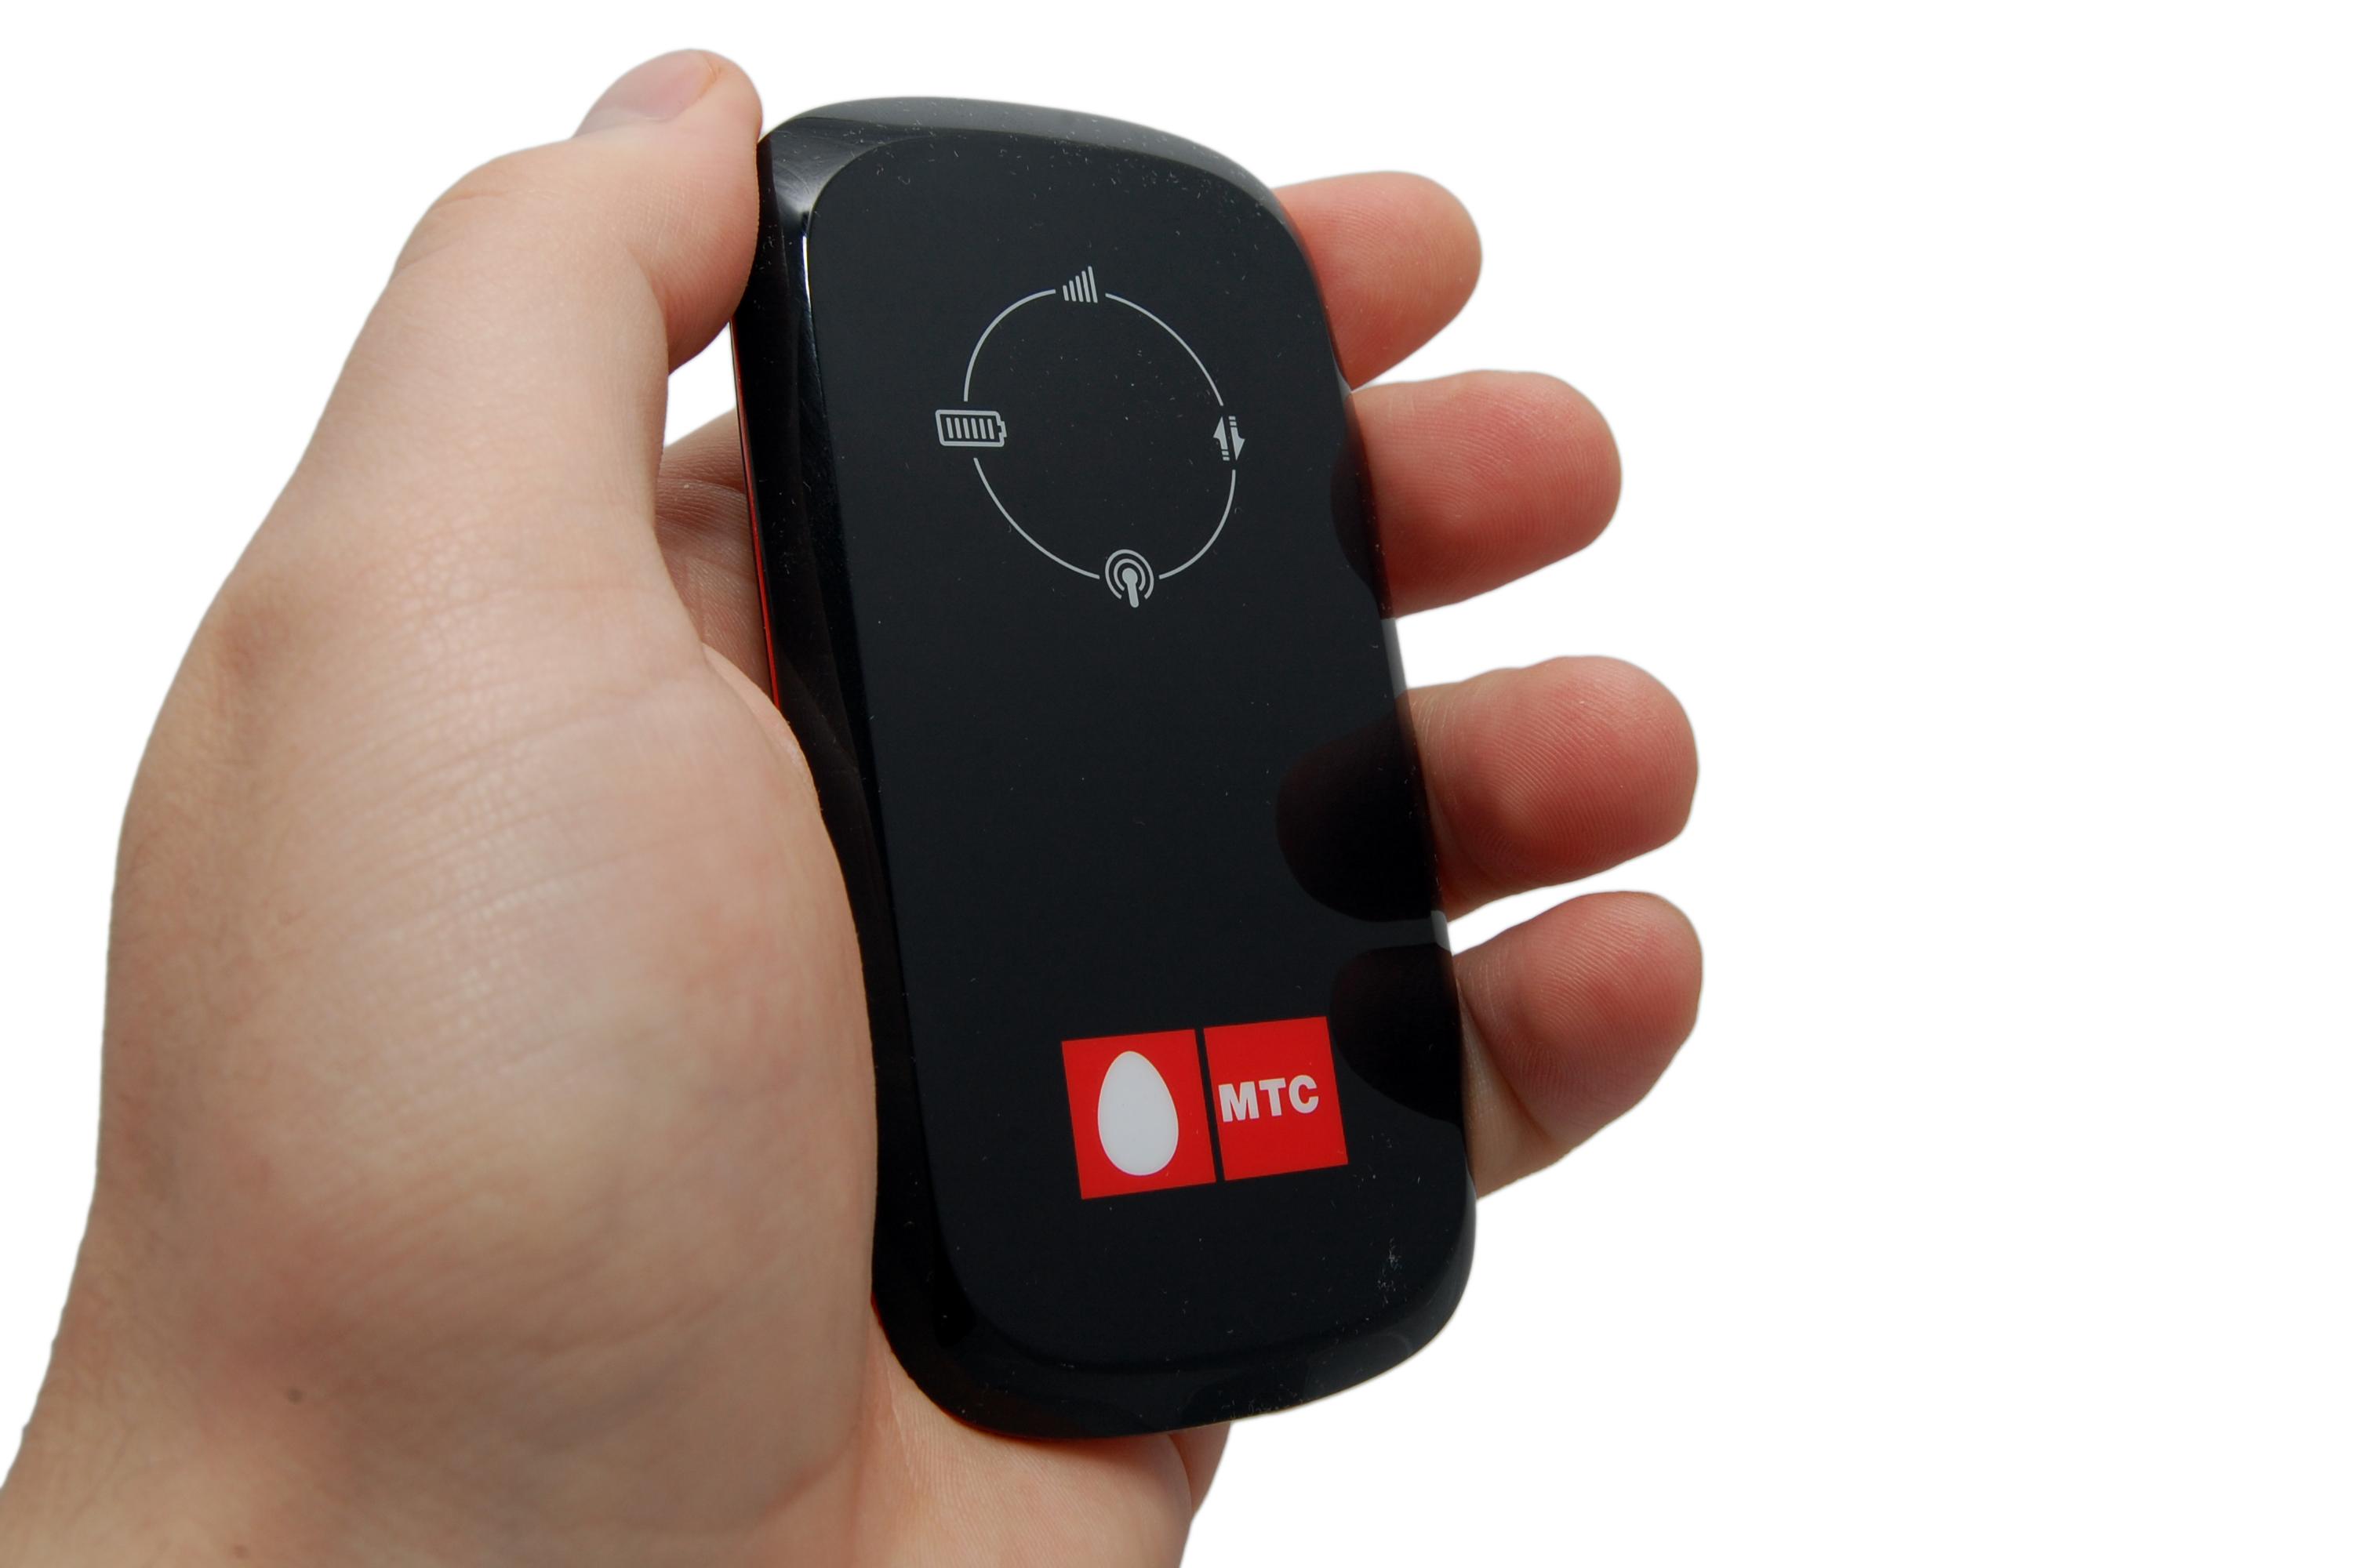 Обзор МТС Коннект 4G LTE Wi-Fi-роутер